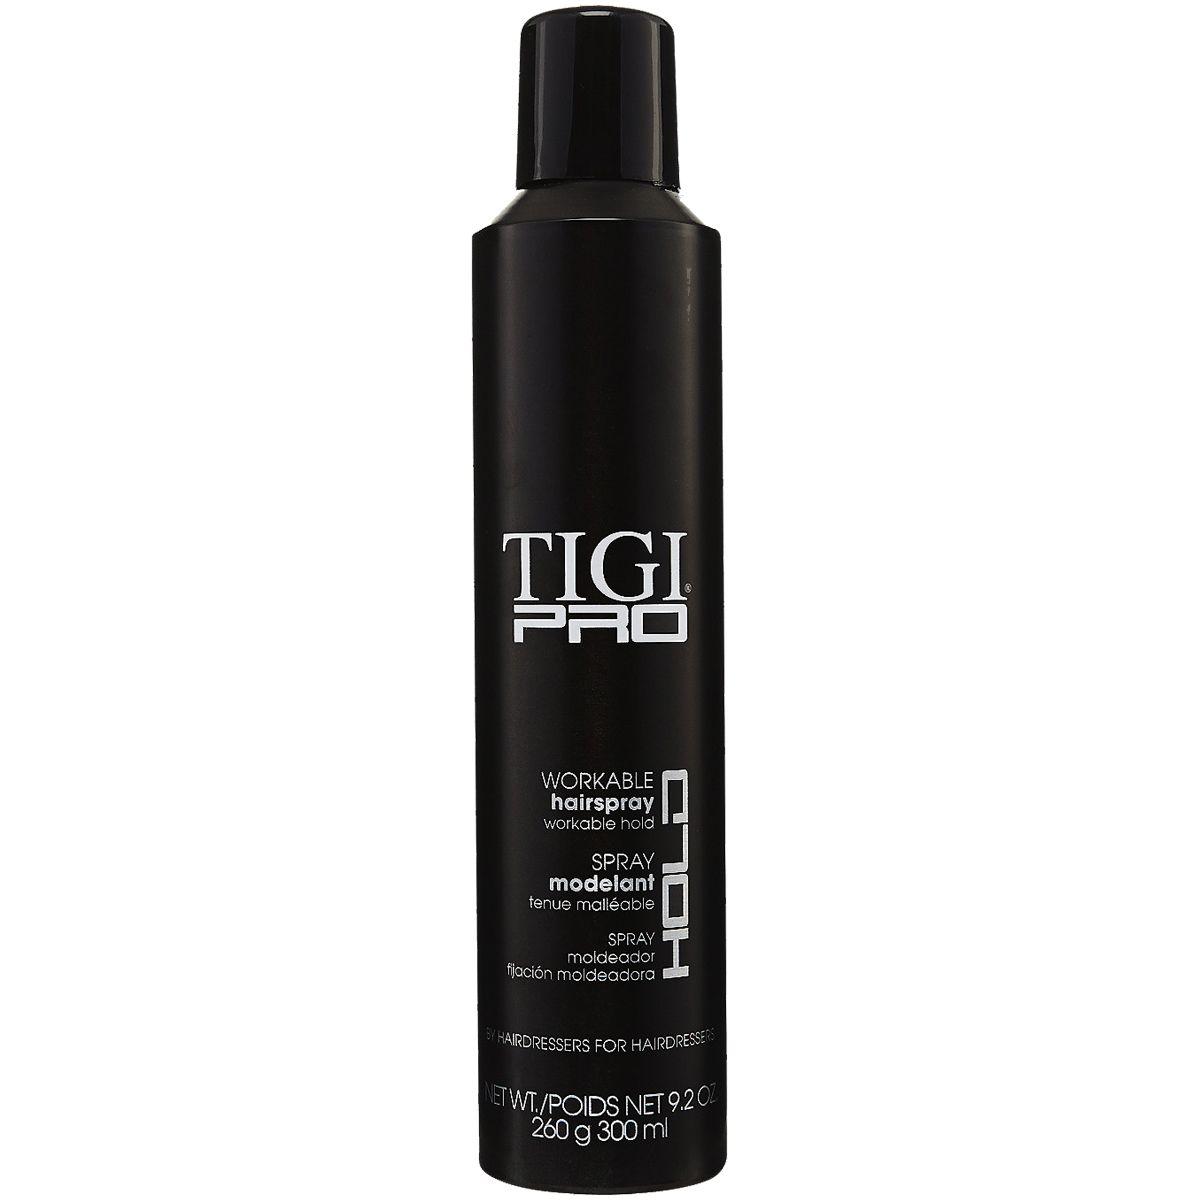 Tigi PRO Workable Hairspray 300ml